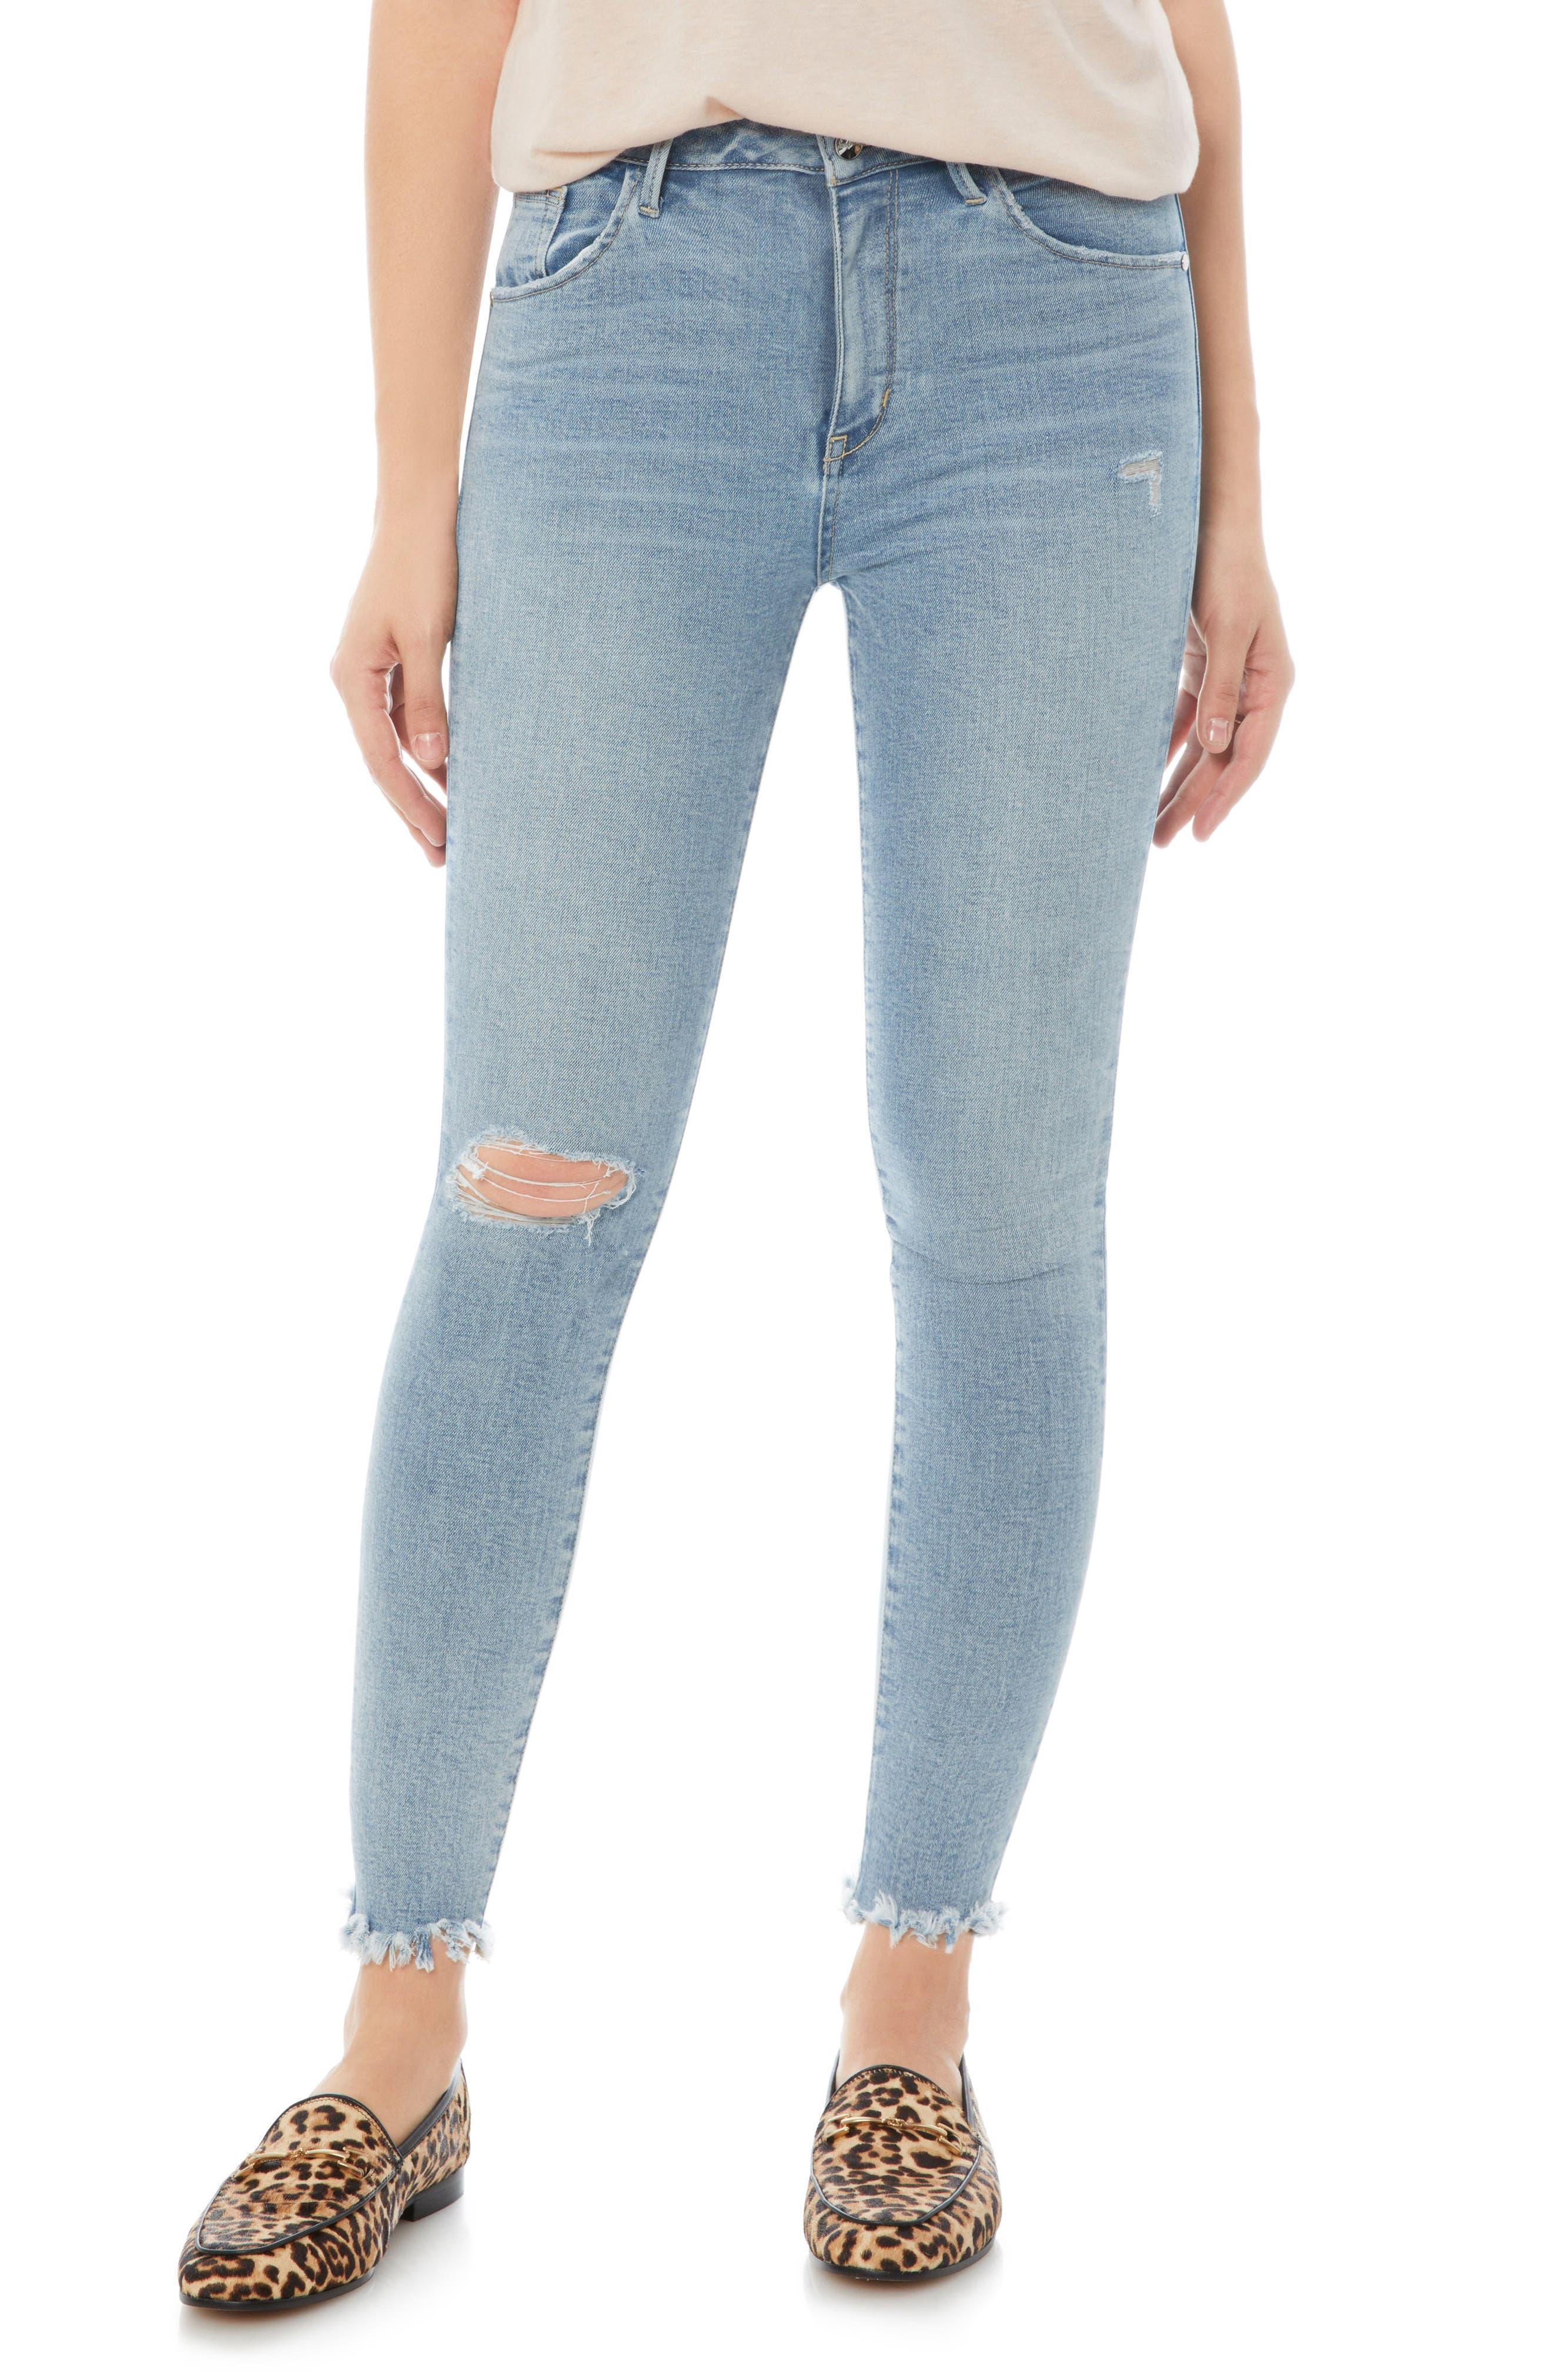 Main Image - Sam Edelman The Stiletto Ripped Fringe Jeans (Honor)